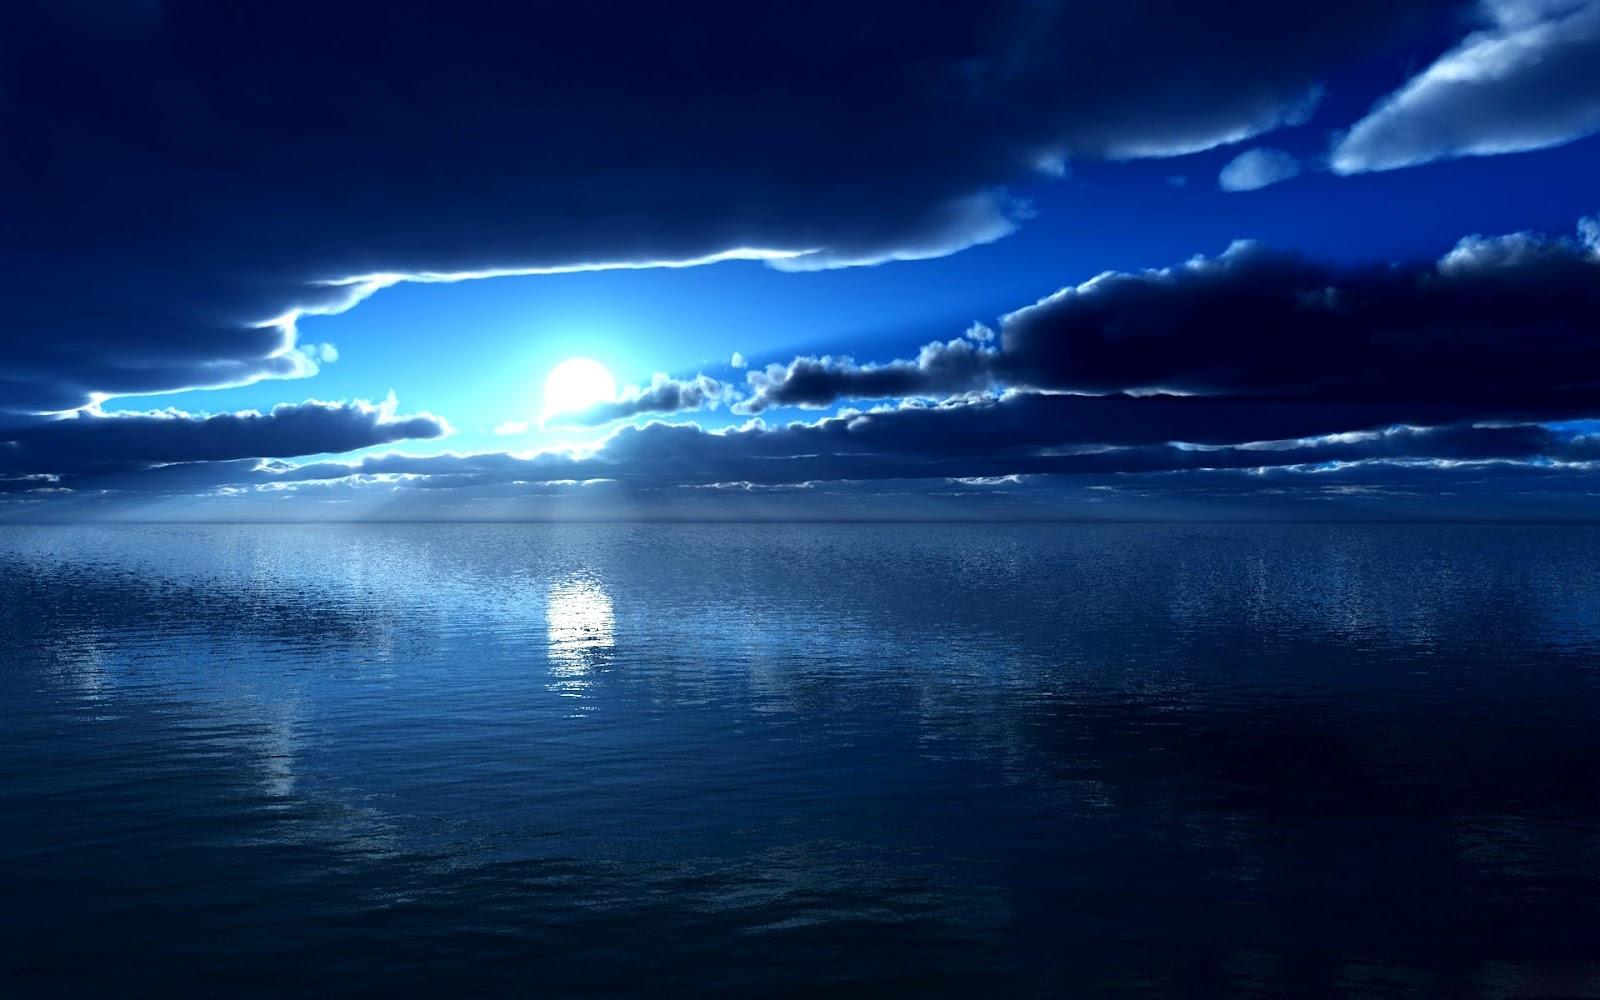 bestofluau Beautiful Night of Sky Wallpapers 1600x1000